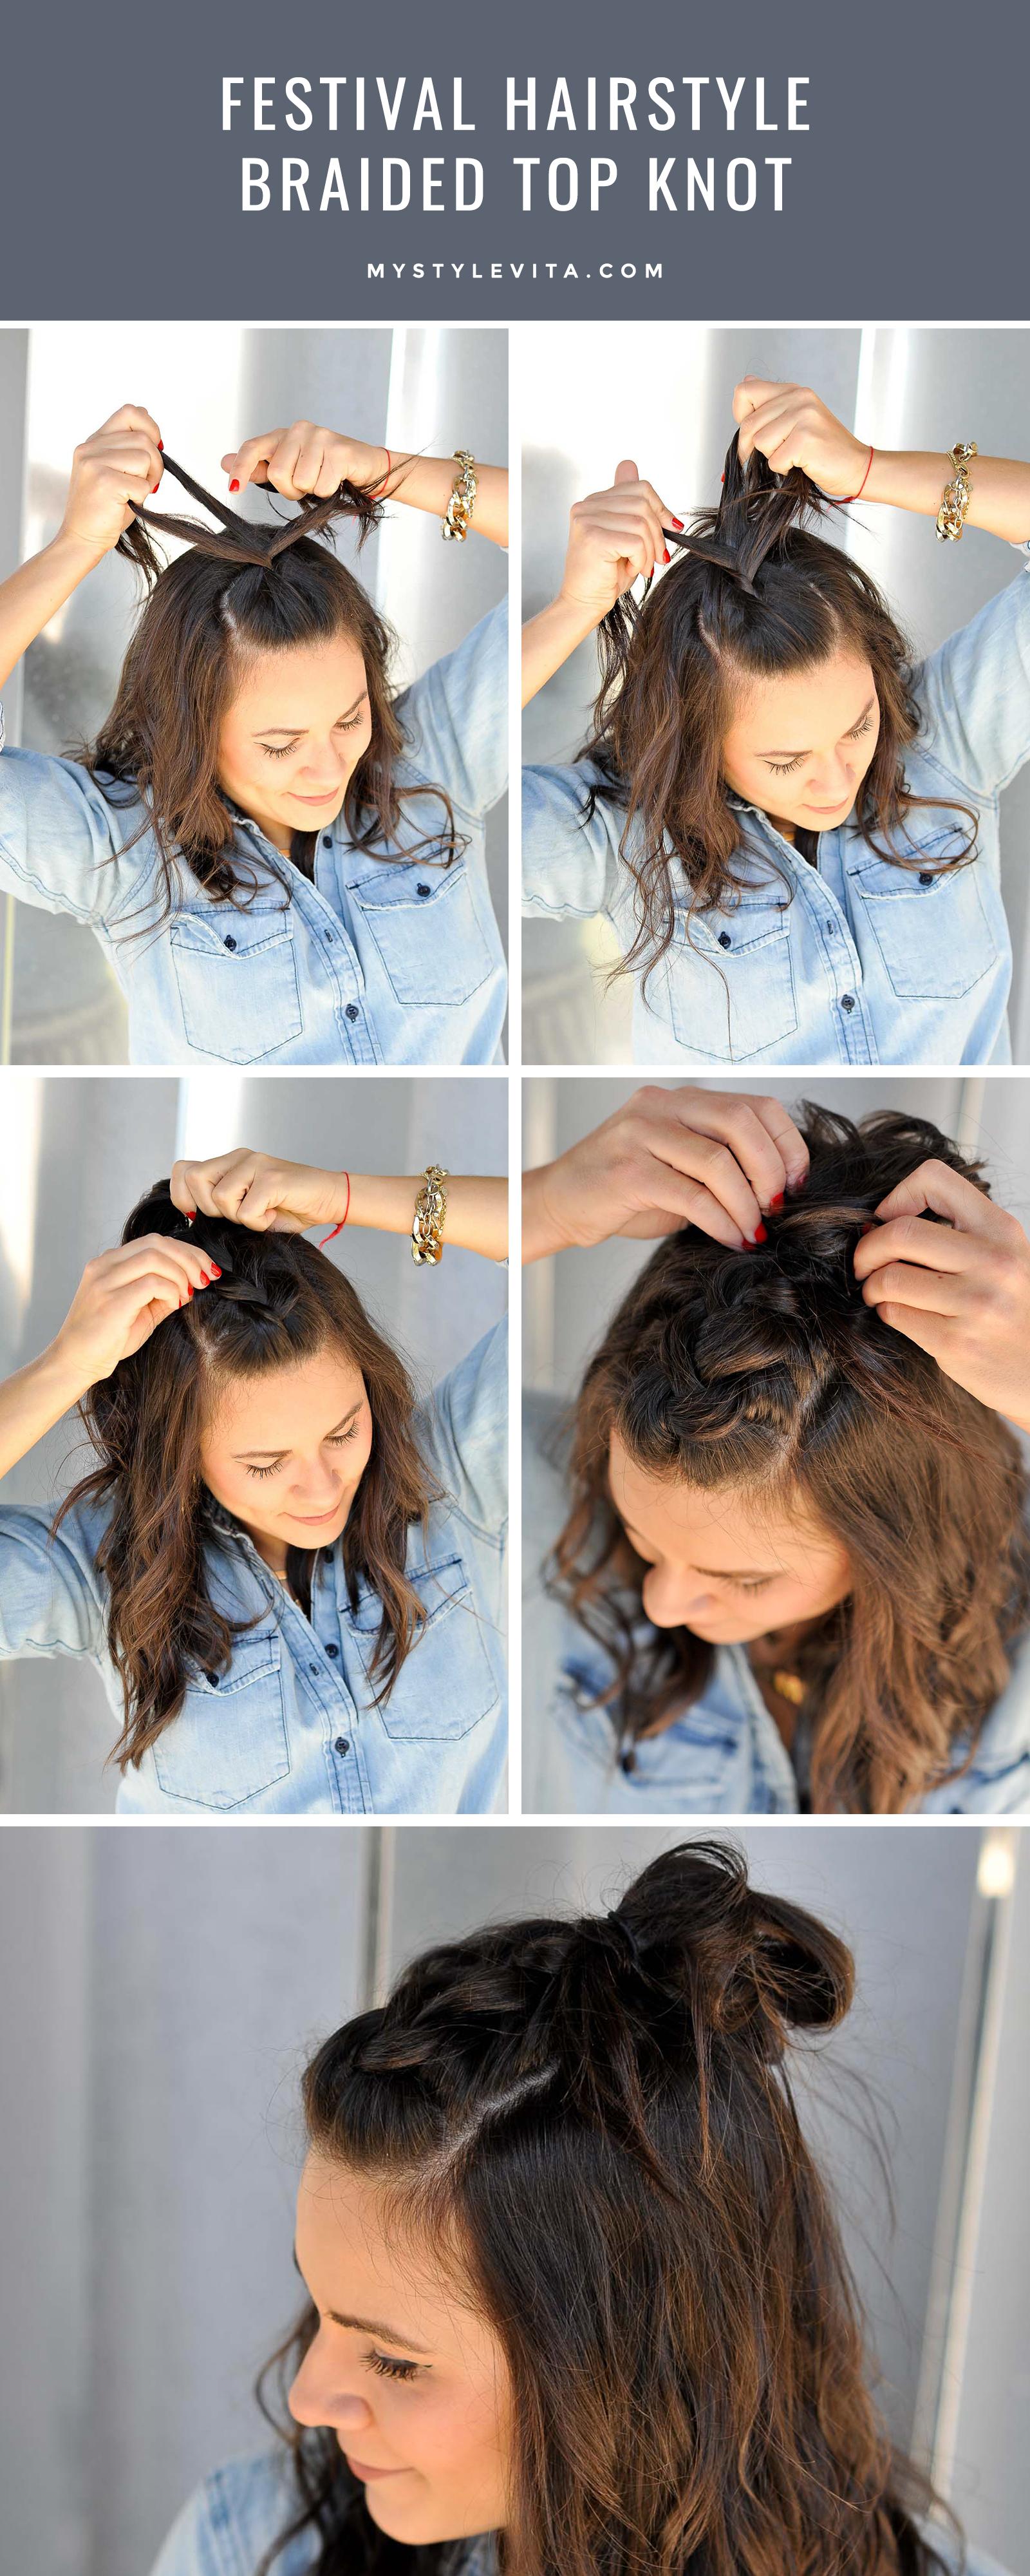 Braided Half Up Half Down Hairstyle Tutorial My Style Vita Braided Hairstyles Easy Top Knot Hairstyles Cool Braid Hairstyles